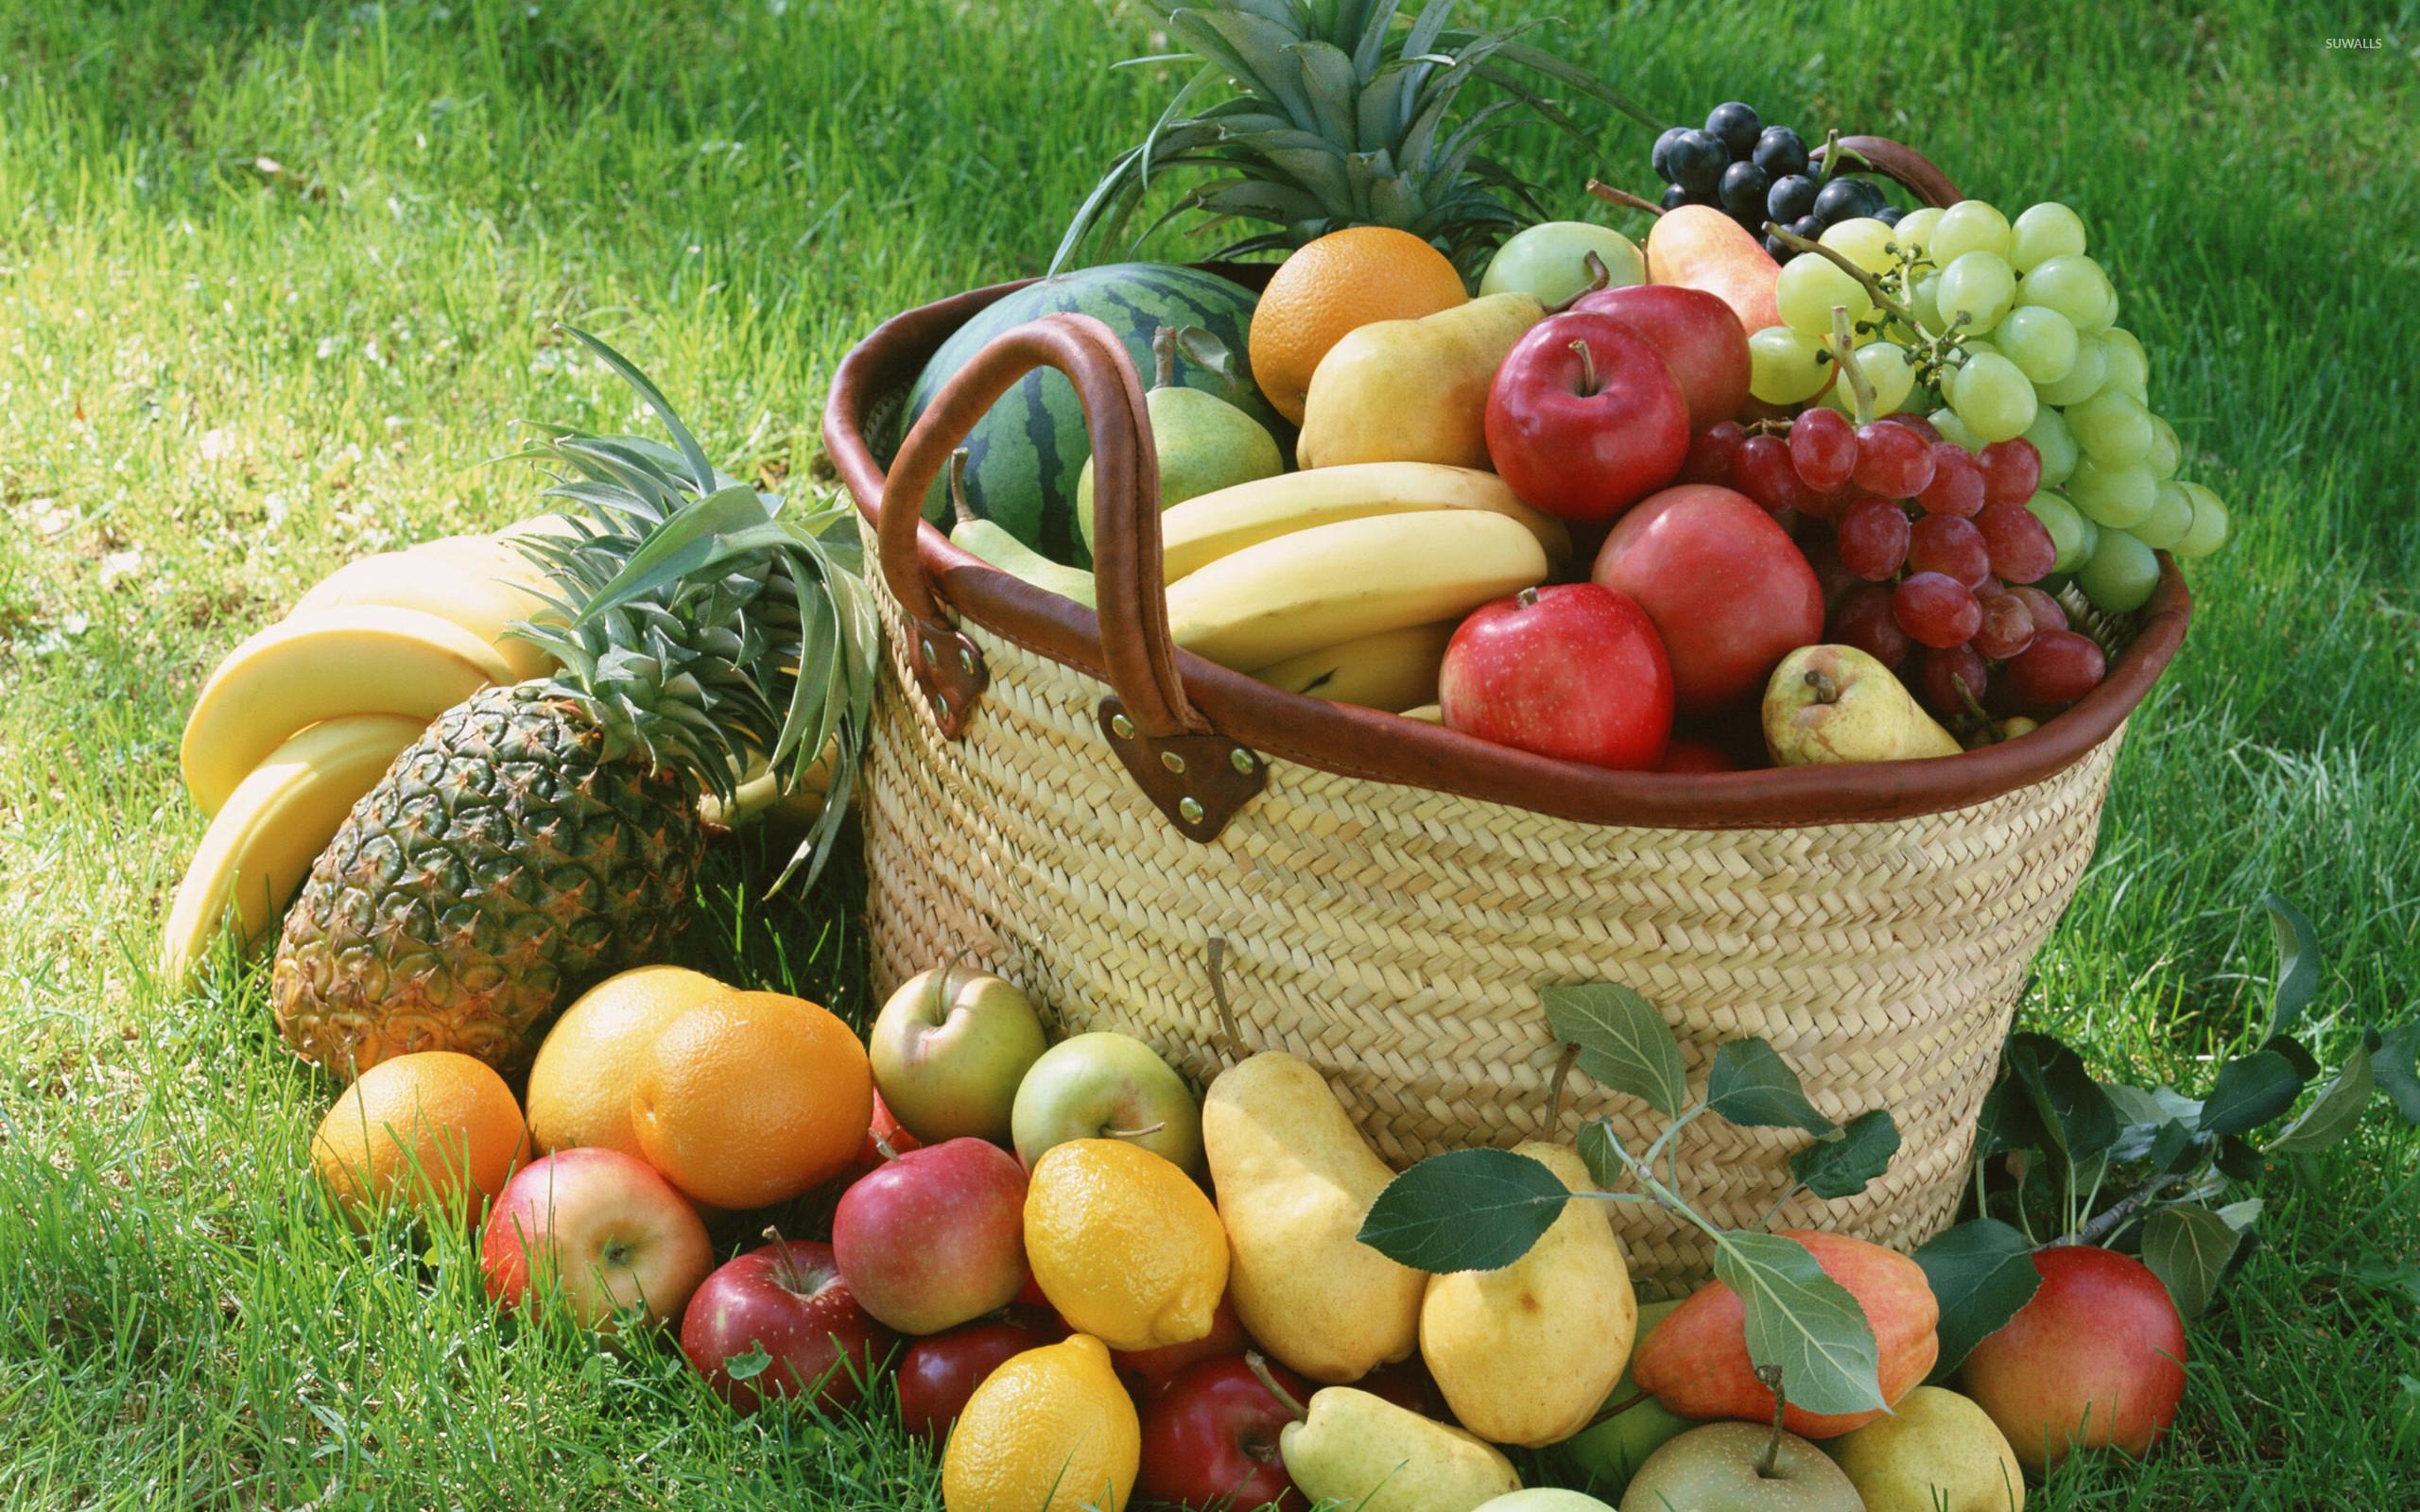 Res: 2560x1600, Fruit basket wallpaper